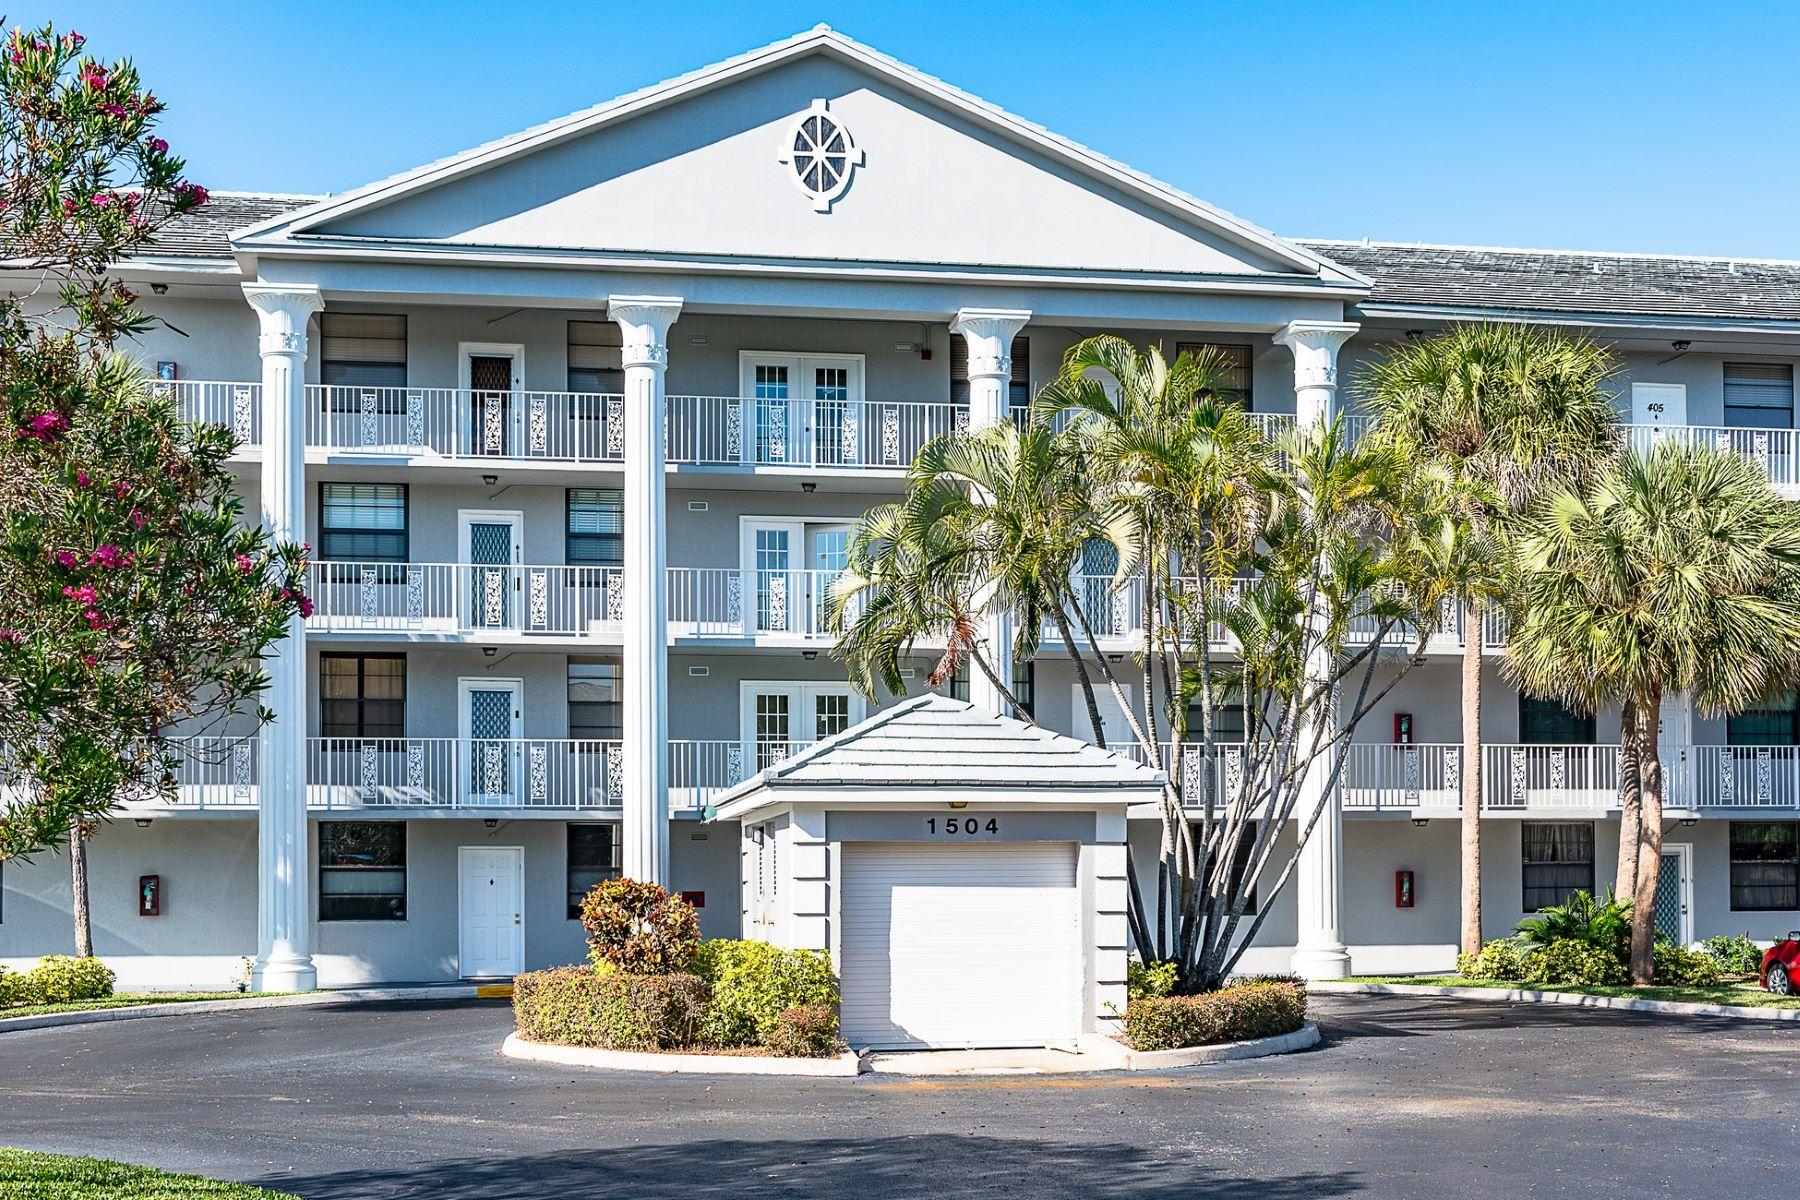 شقة بعمارة للـ Sale في 1504 Whitehall Dr. # 402 Davie, Florida, 33324 United States